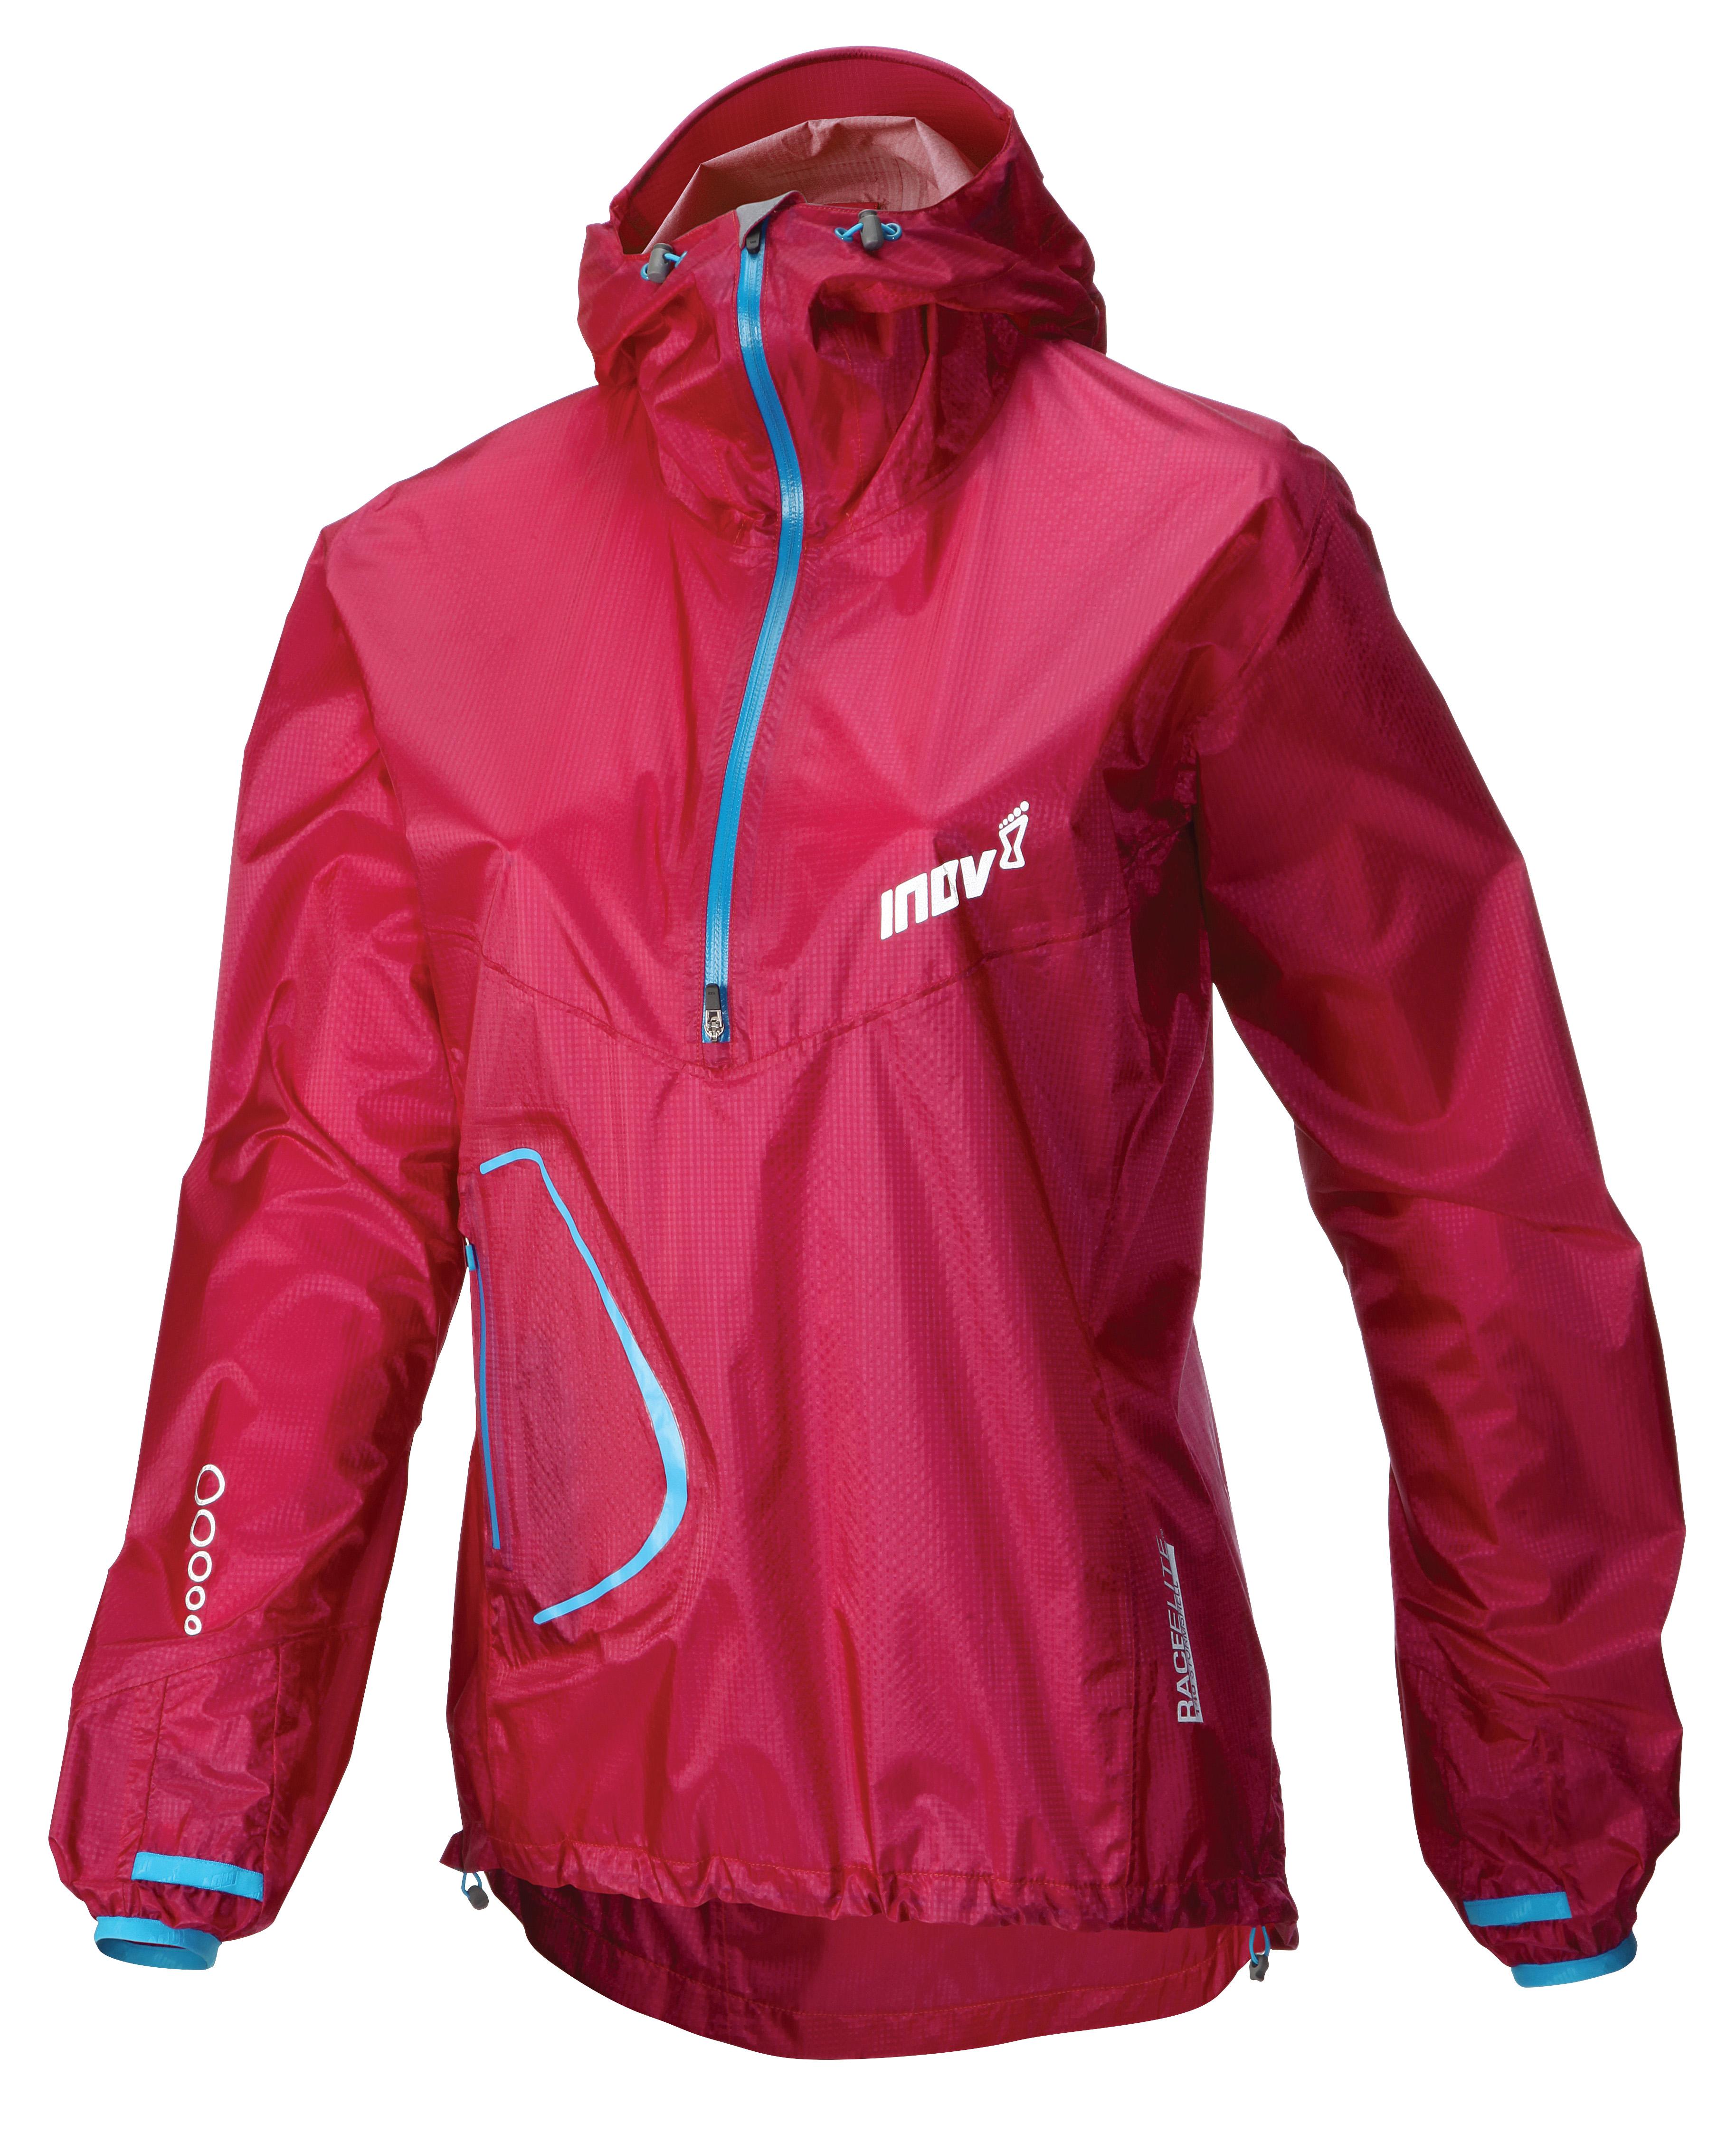 Women's race elite 140 stormshell - in new colours for autumn/winter 2014